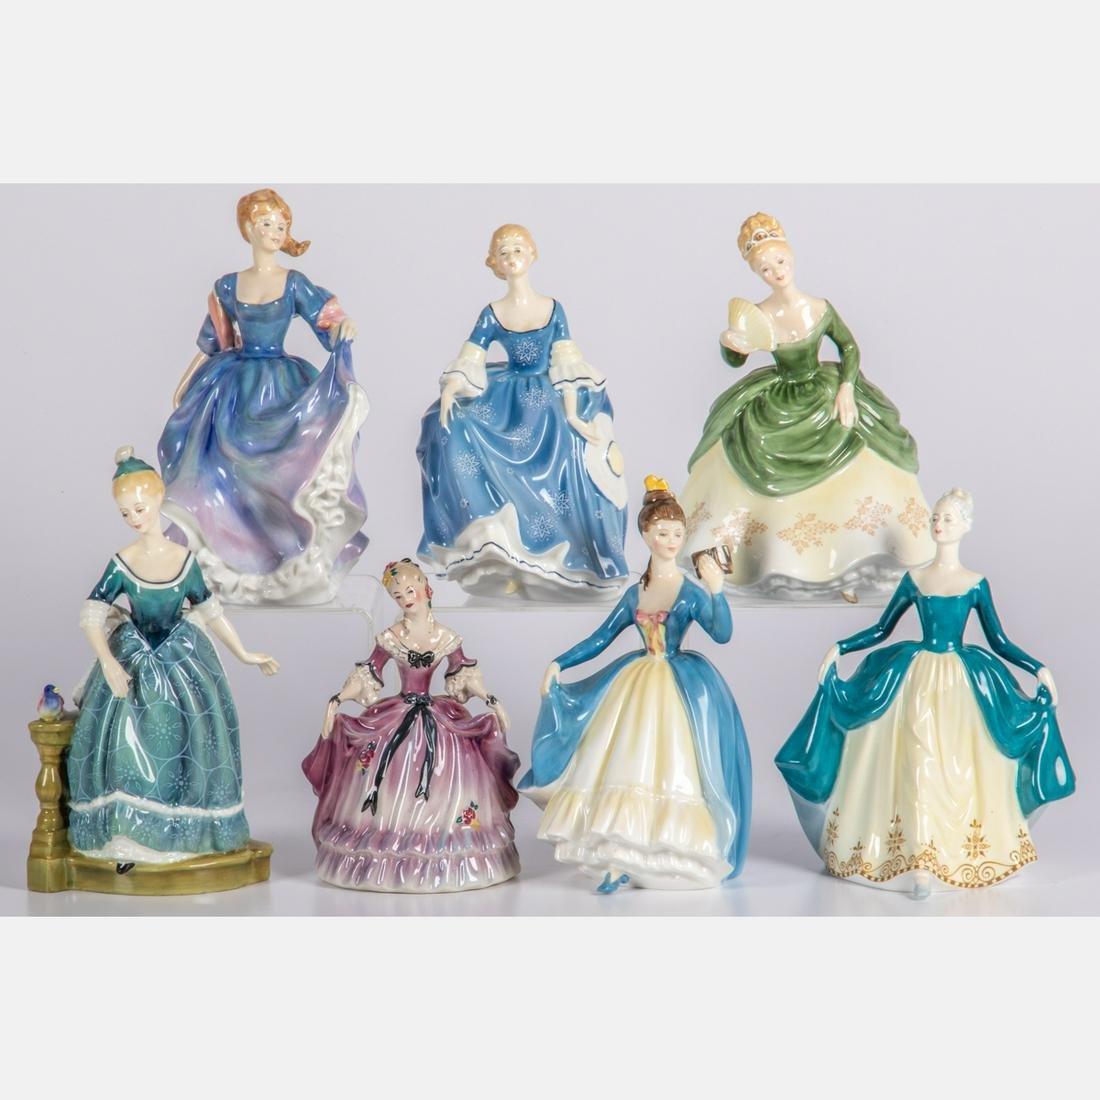 A Group of Seven Royal Doulton Porcelain Figures, 20th